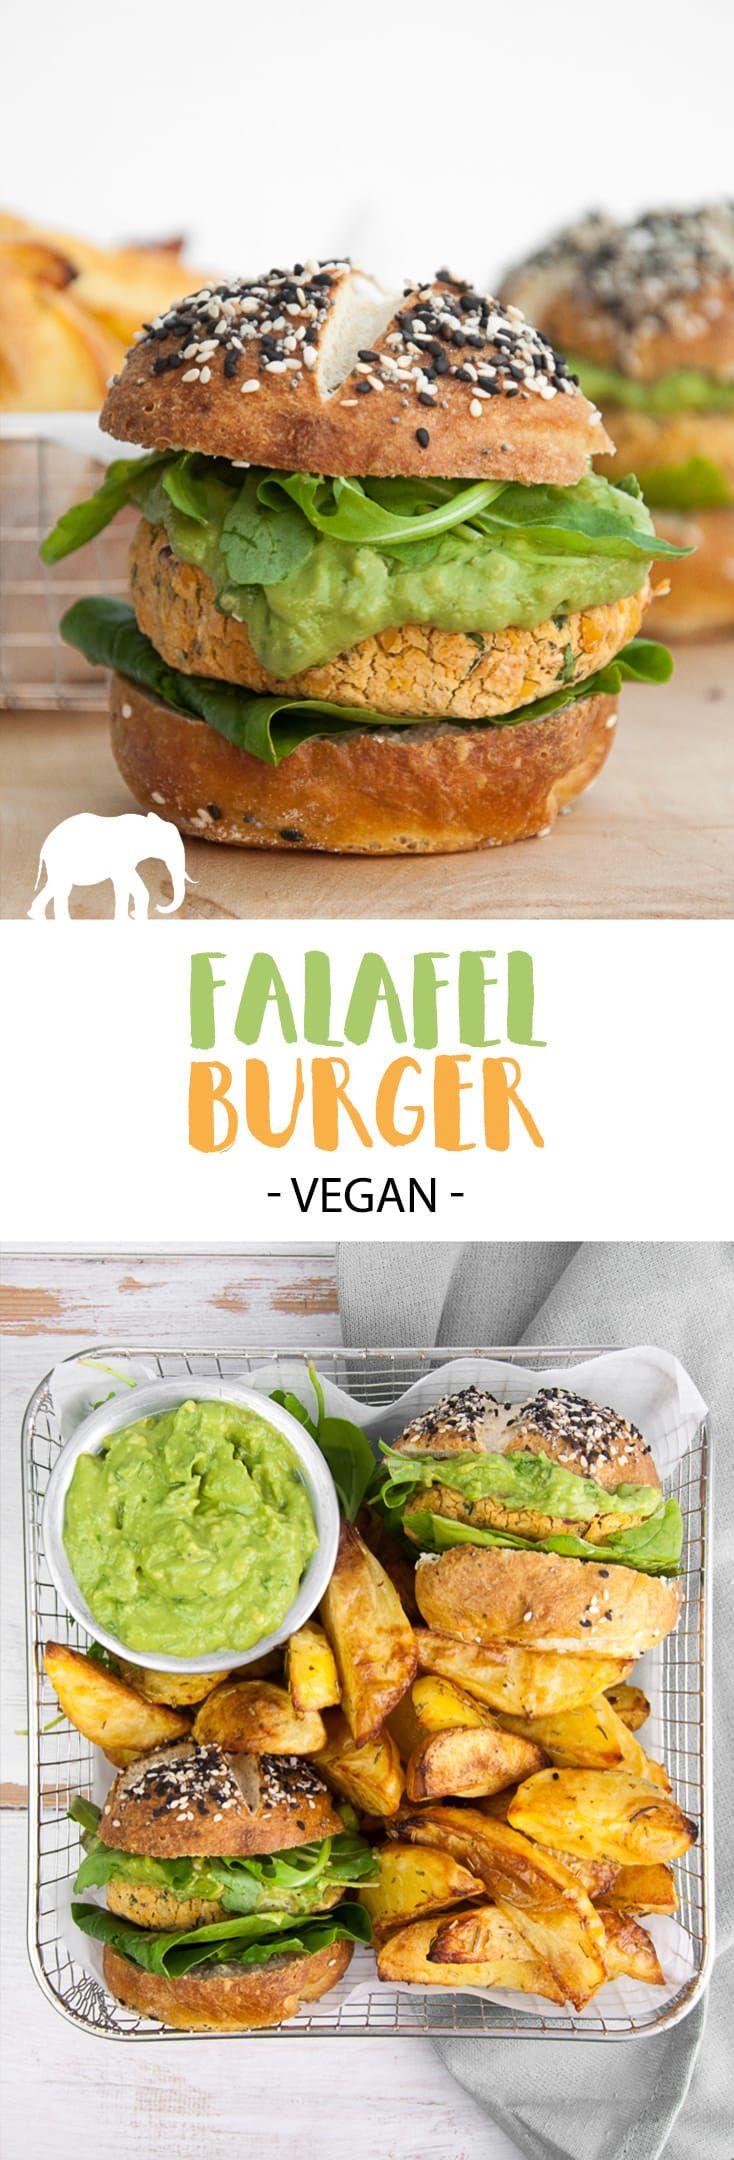 Vegan Falafel Burger #vegan #falafel #burger #chickpeas | ElephantasticVegan.com